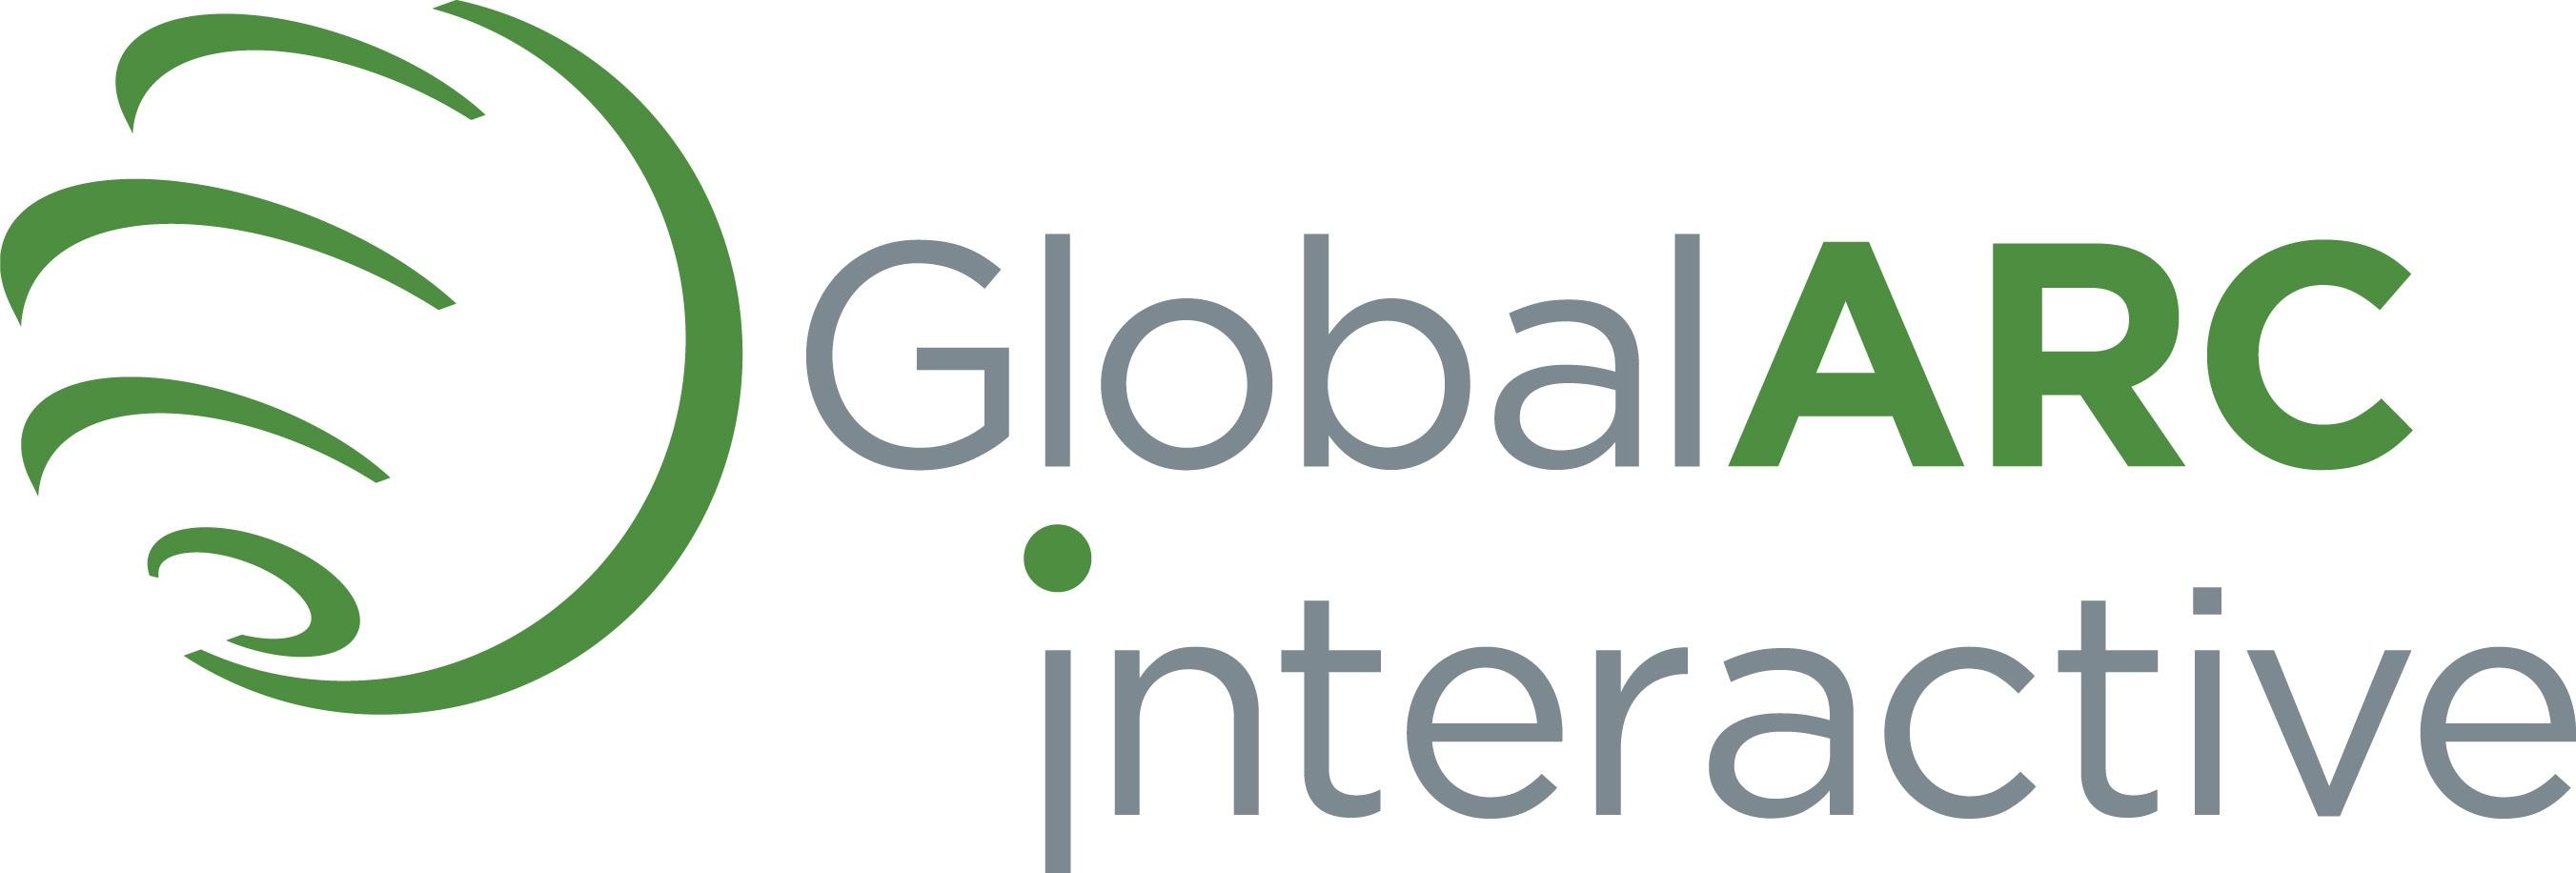 Global ARC Interactive - ESG